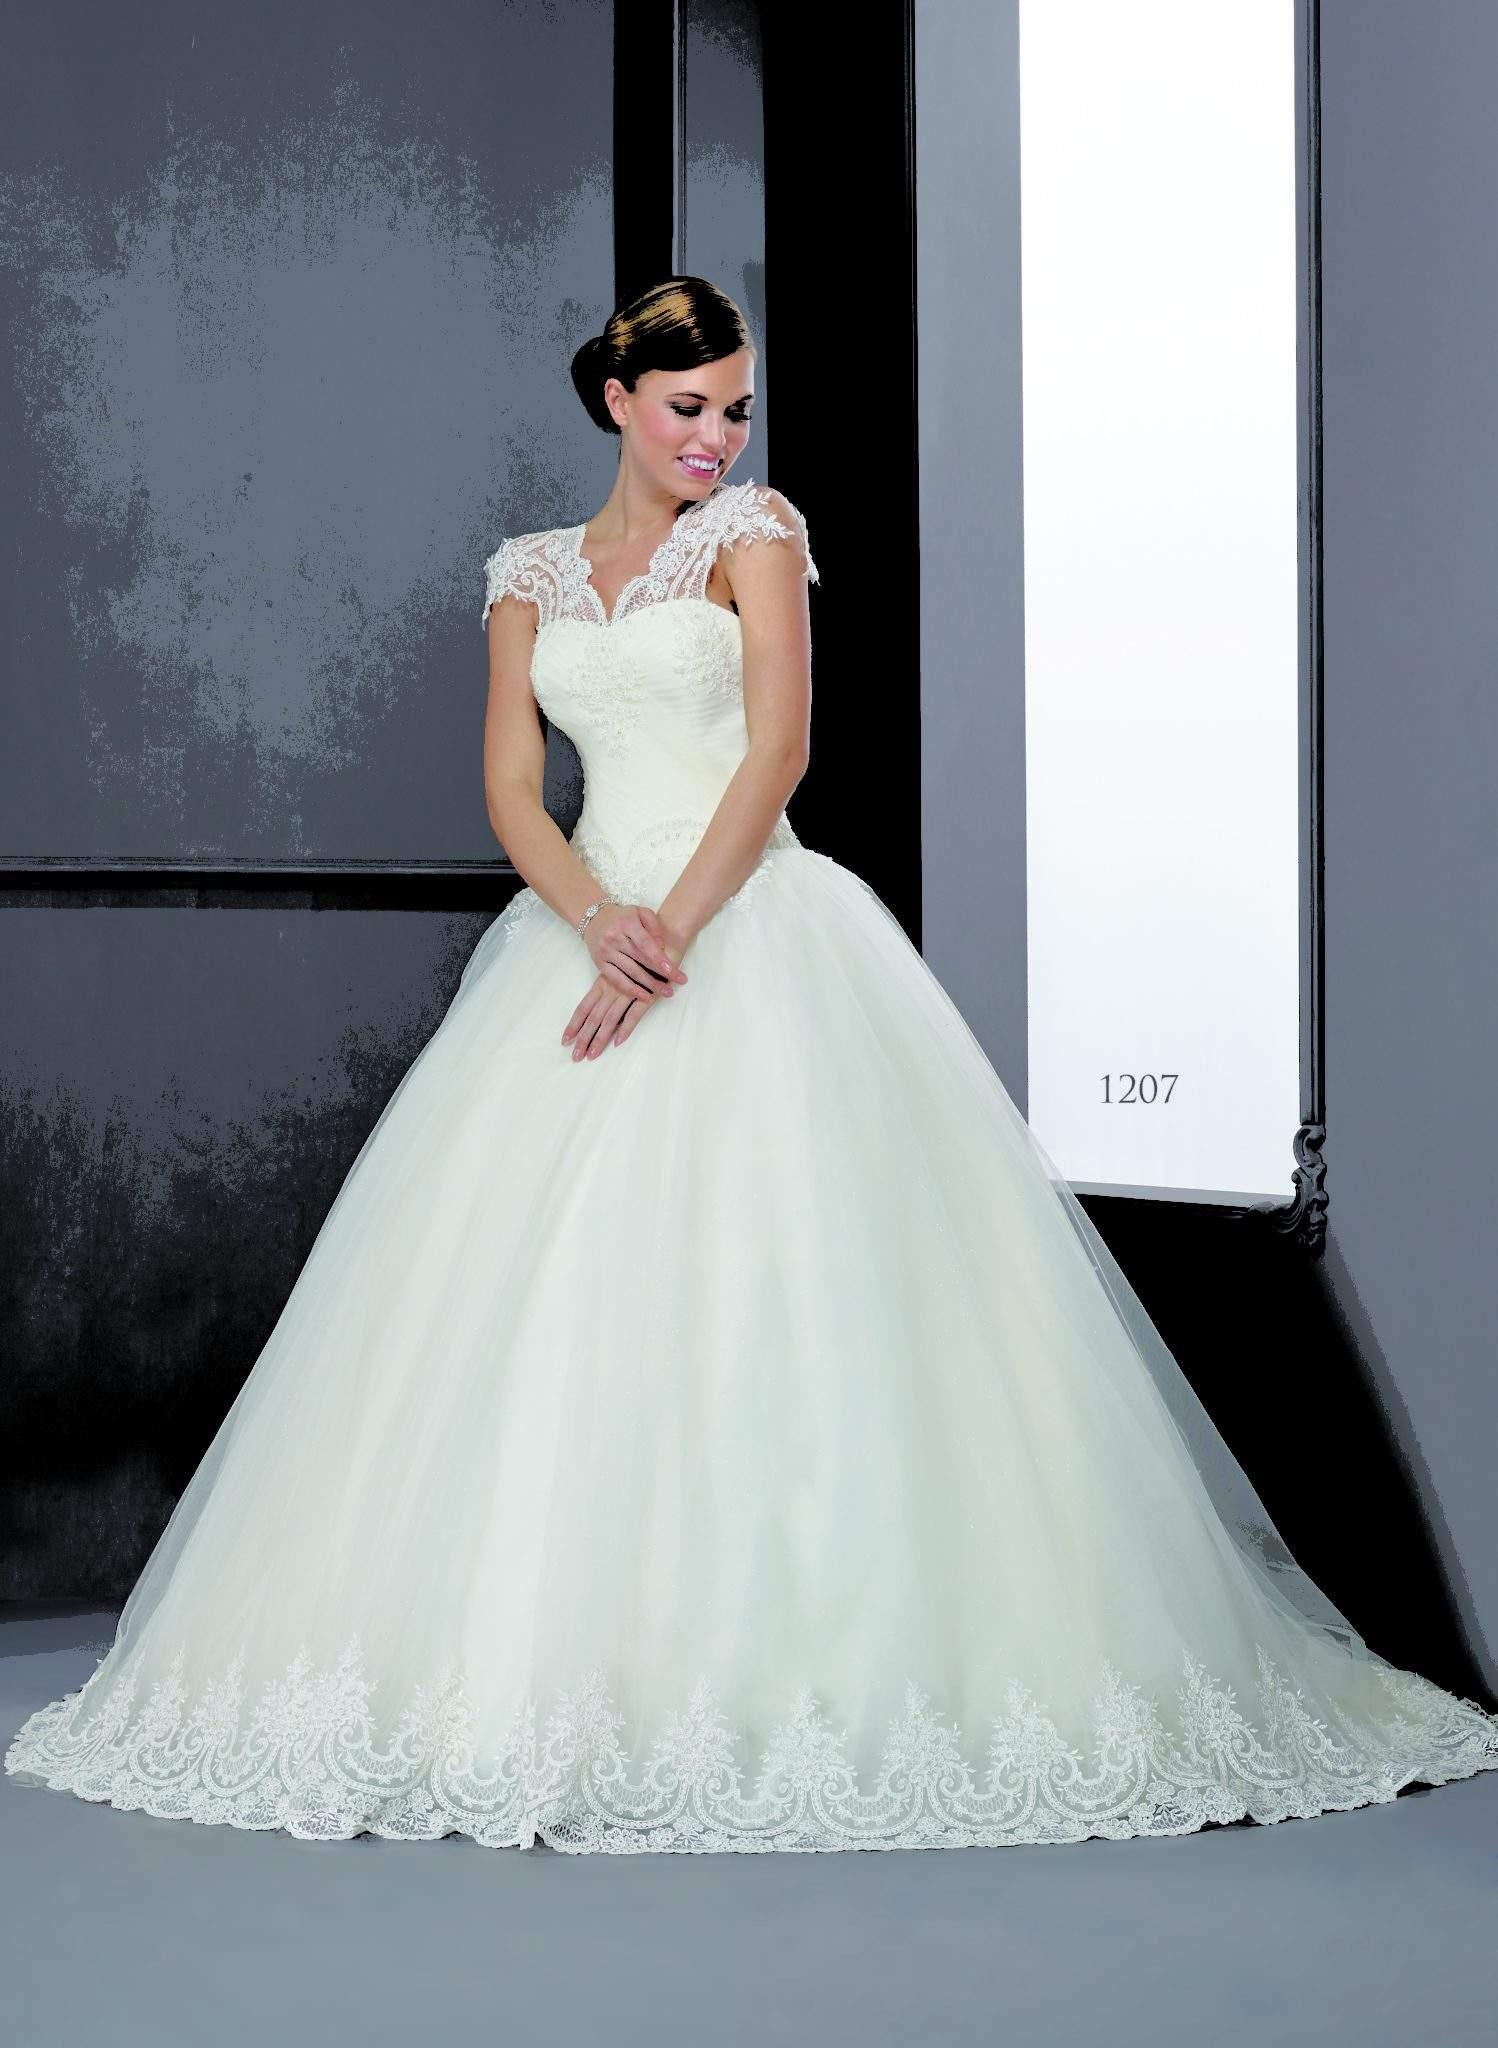 Cap Sleeve Wedding Ball Gowns - Darius Cordell Fashion Ltd